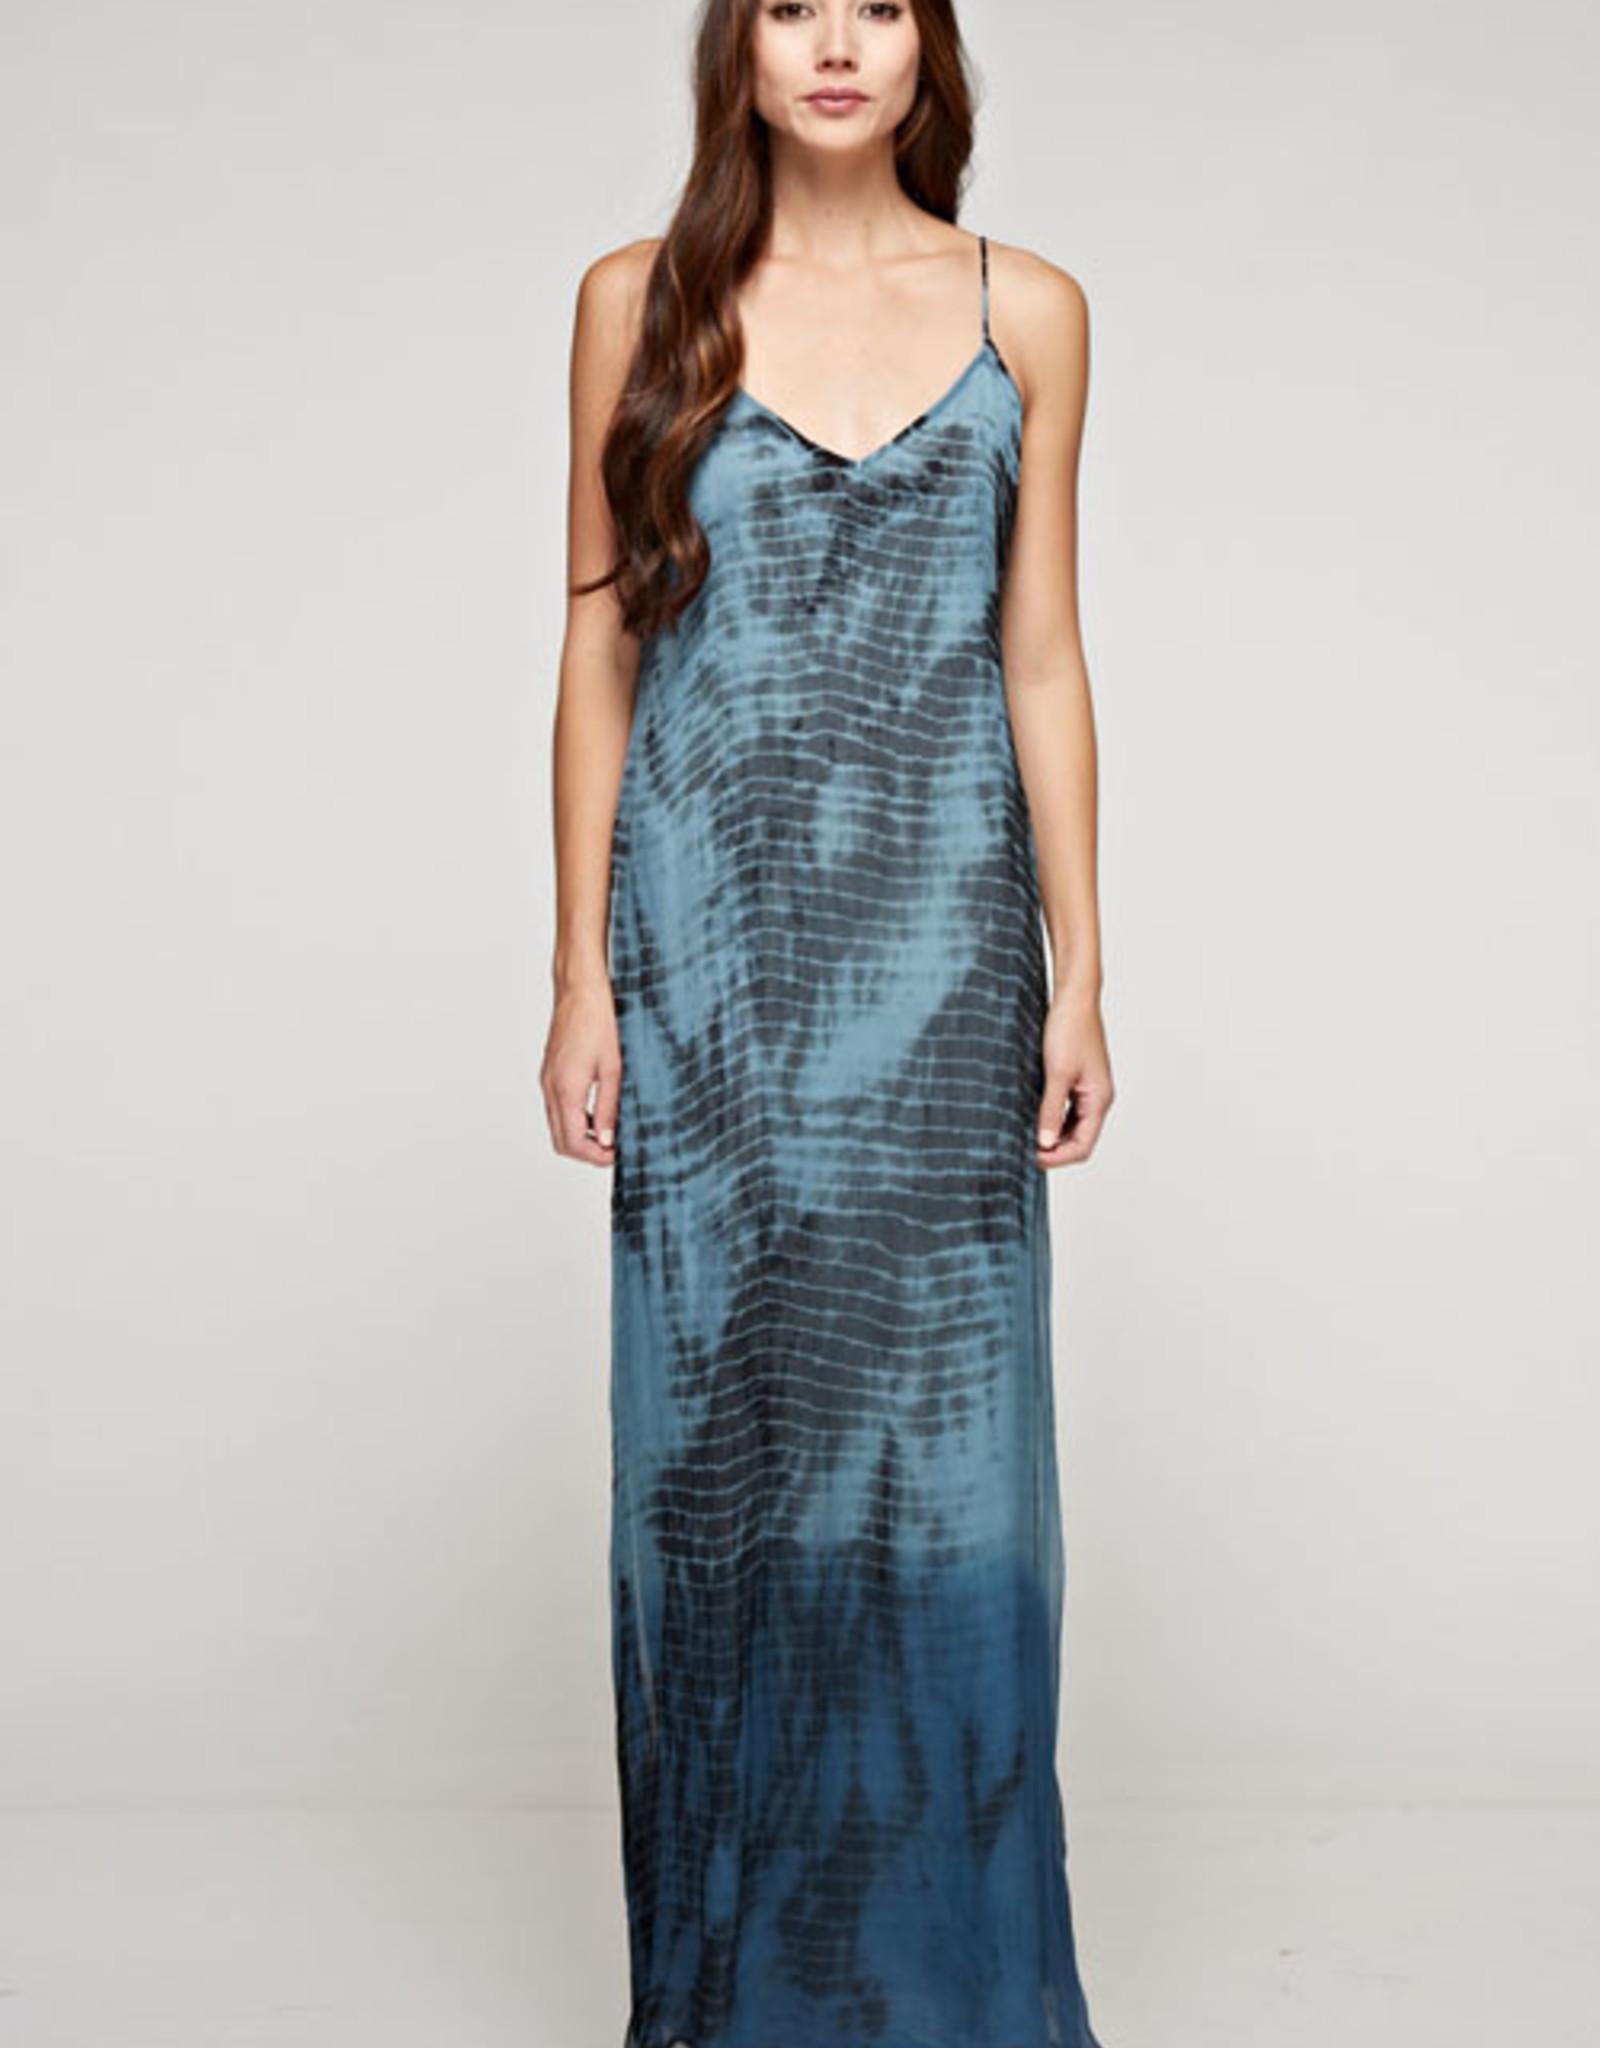 Lovestitch Ombre Tie Dye Maxi Slip Dress